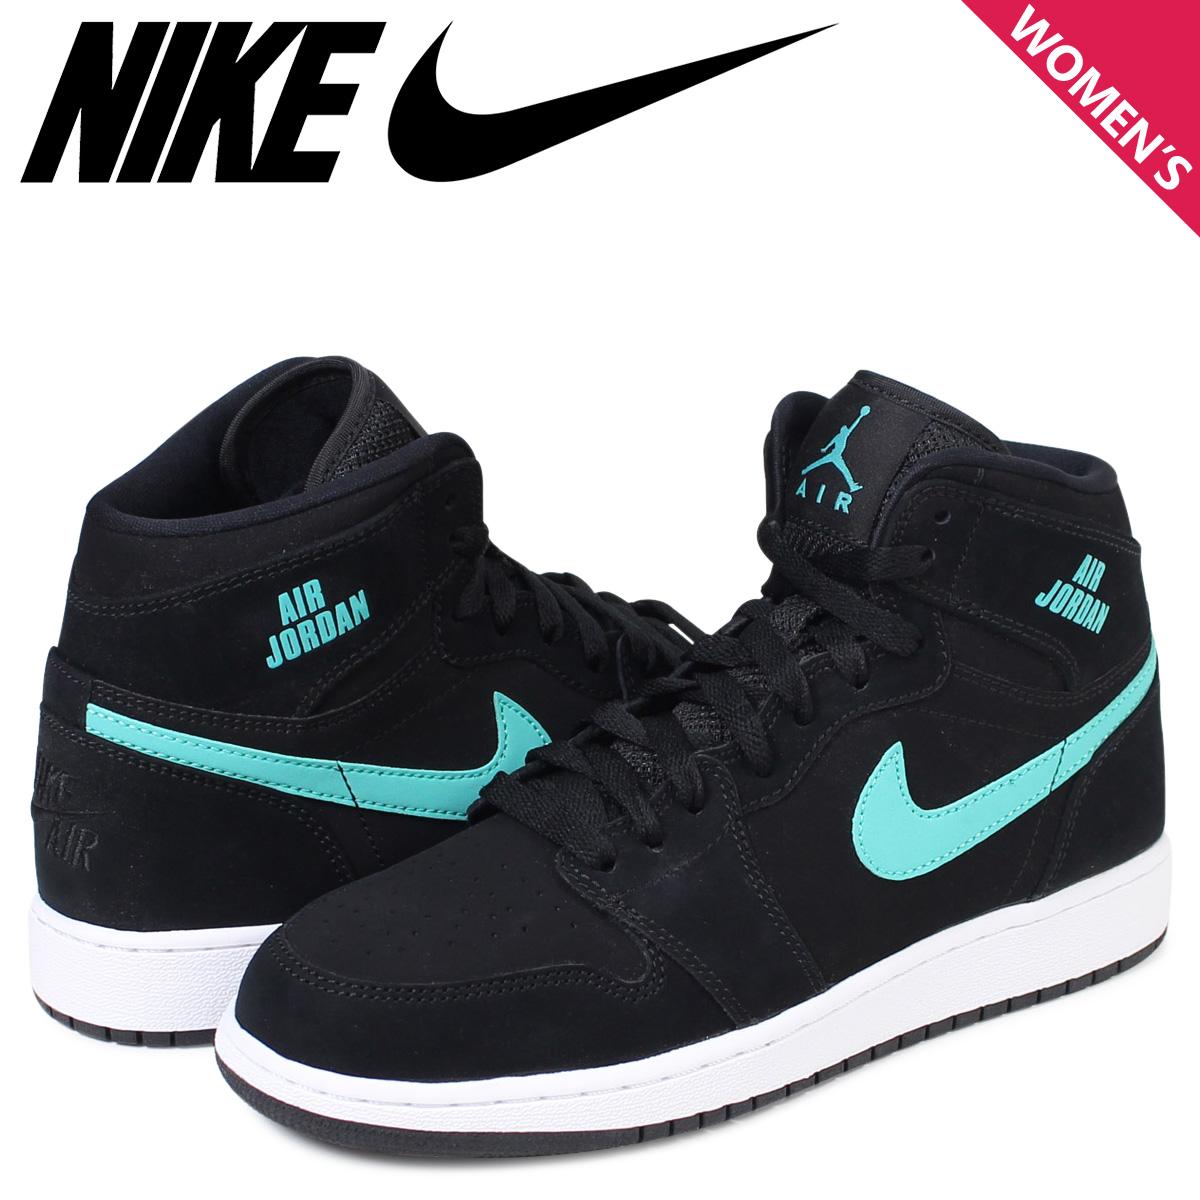 NIKE Nike Air Jordan 1 nostalgic Haile Dis sneakers AIR JORDAN 1 RETRO HIGH  BG 705 9cb264bcf24a